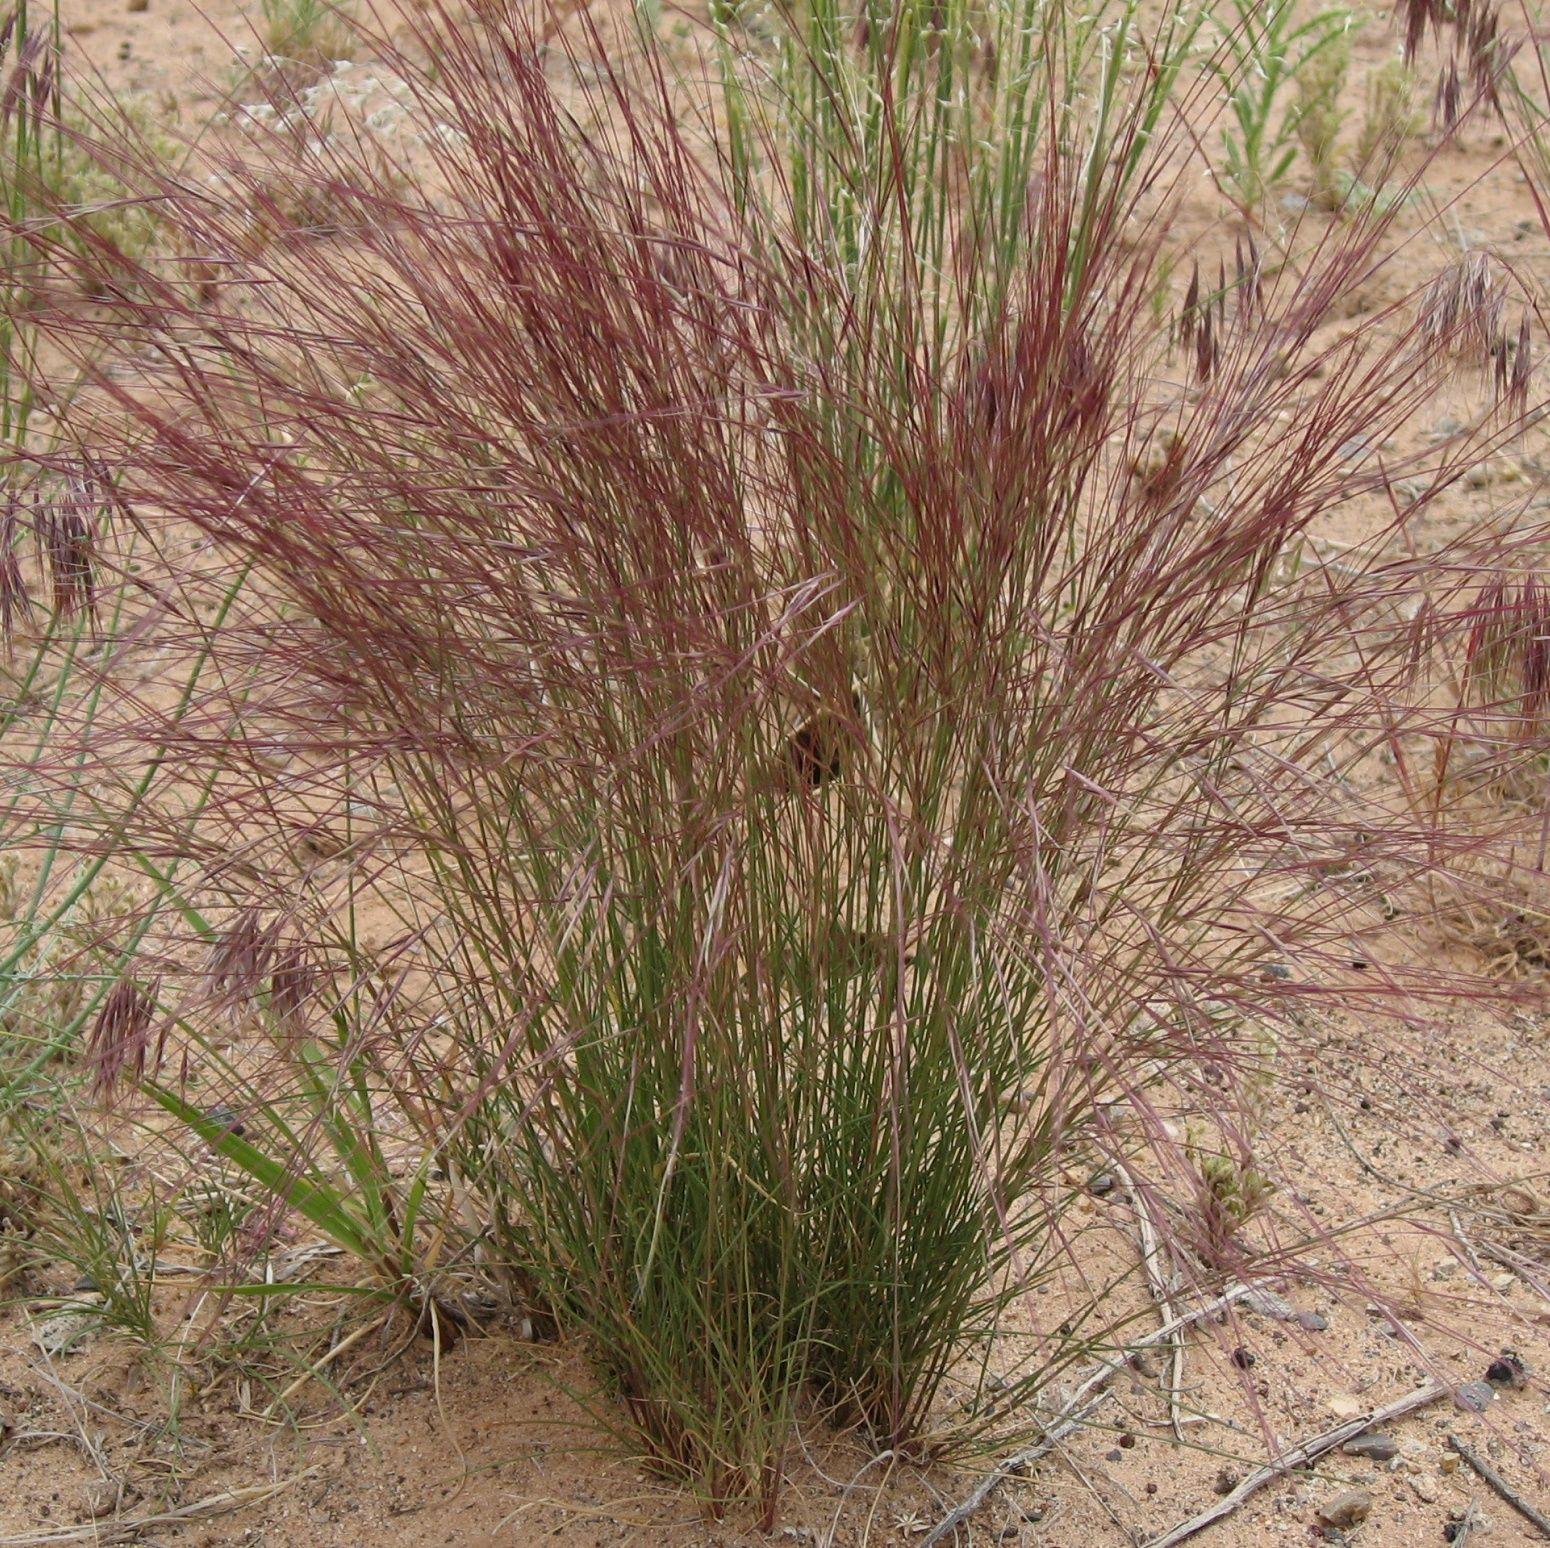 Aristida purpurea aristida purpurea longiseta for Purple grass